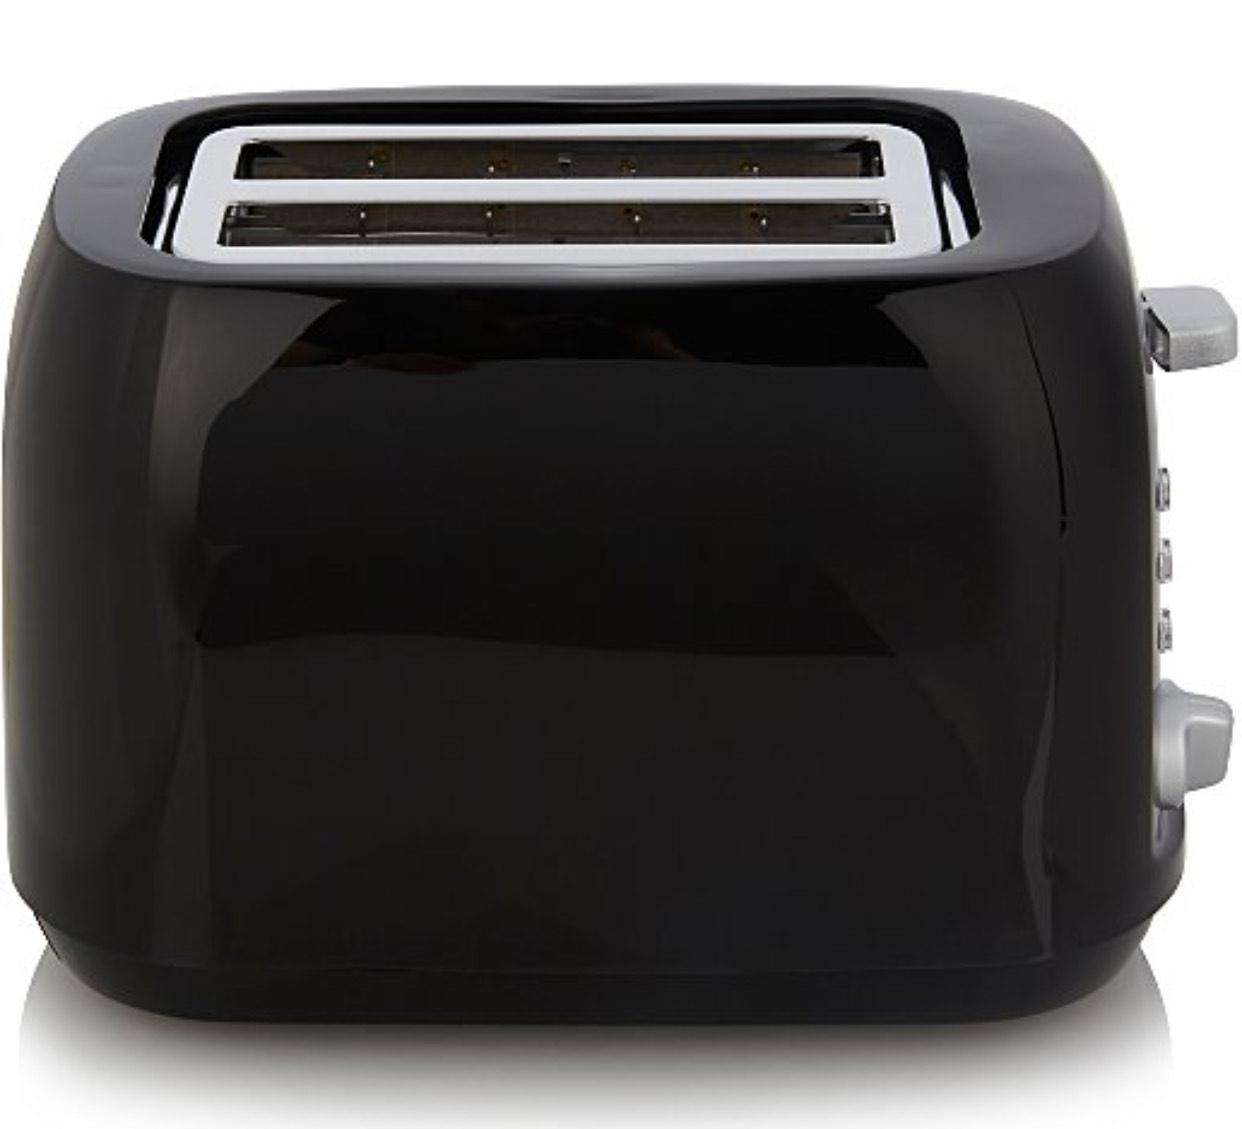 George 2 slice toaster black £10 (Free Click & Collect) @ George (Asda)